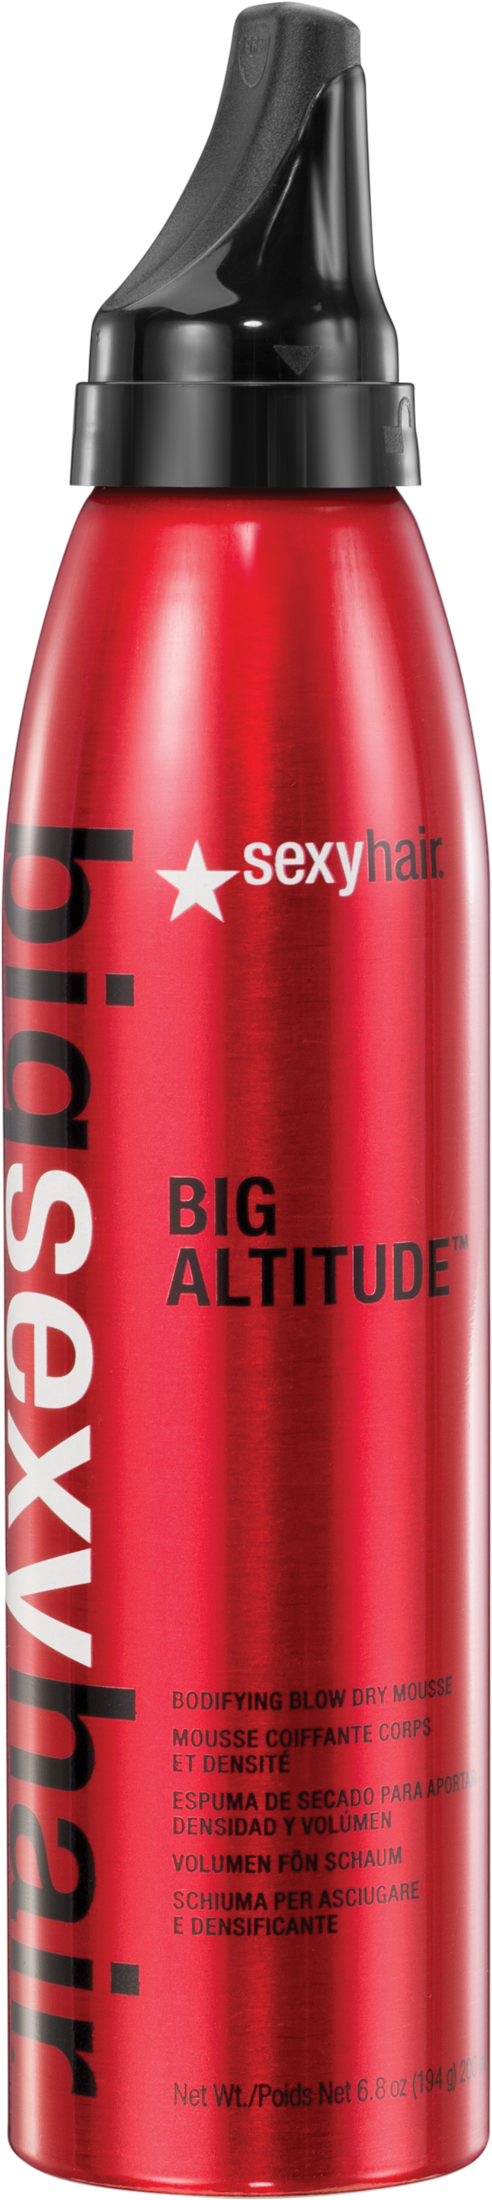 SEXY HAIR Мусс для подвижного объема / BIG 200 мл